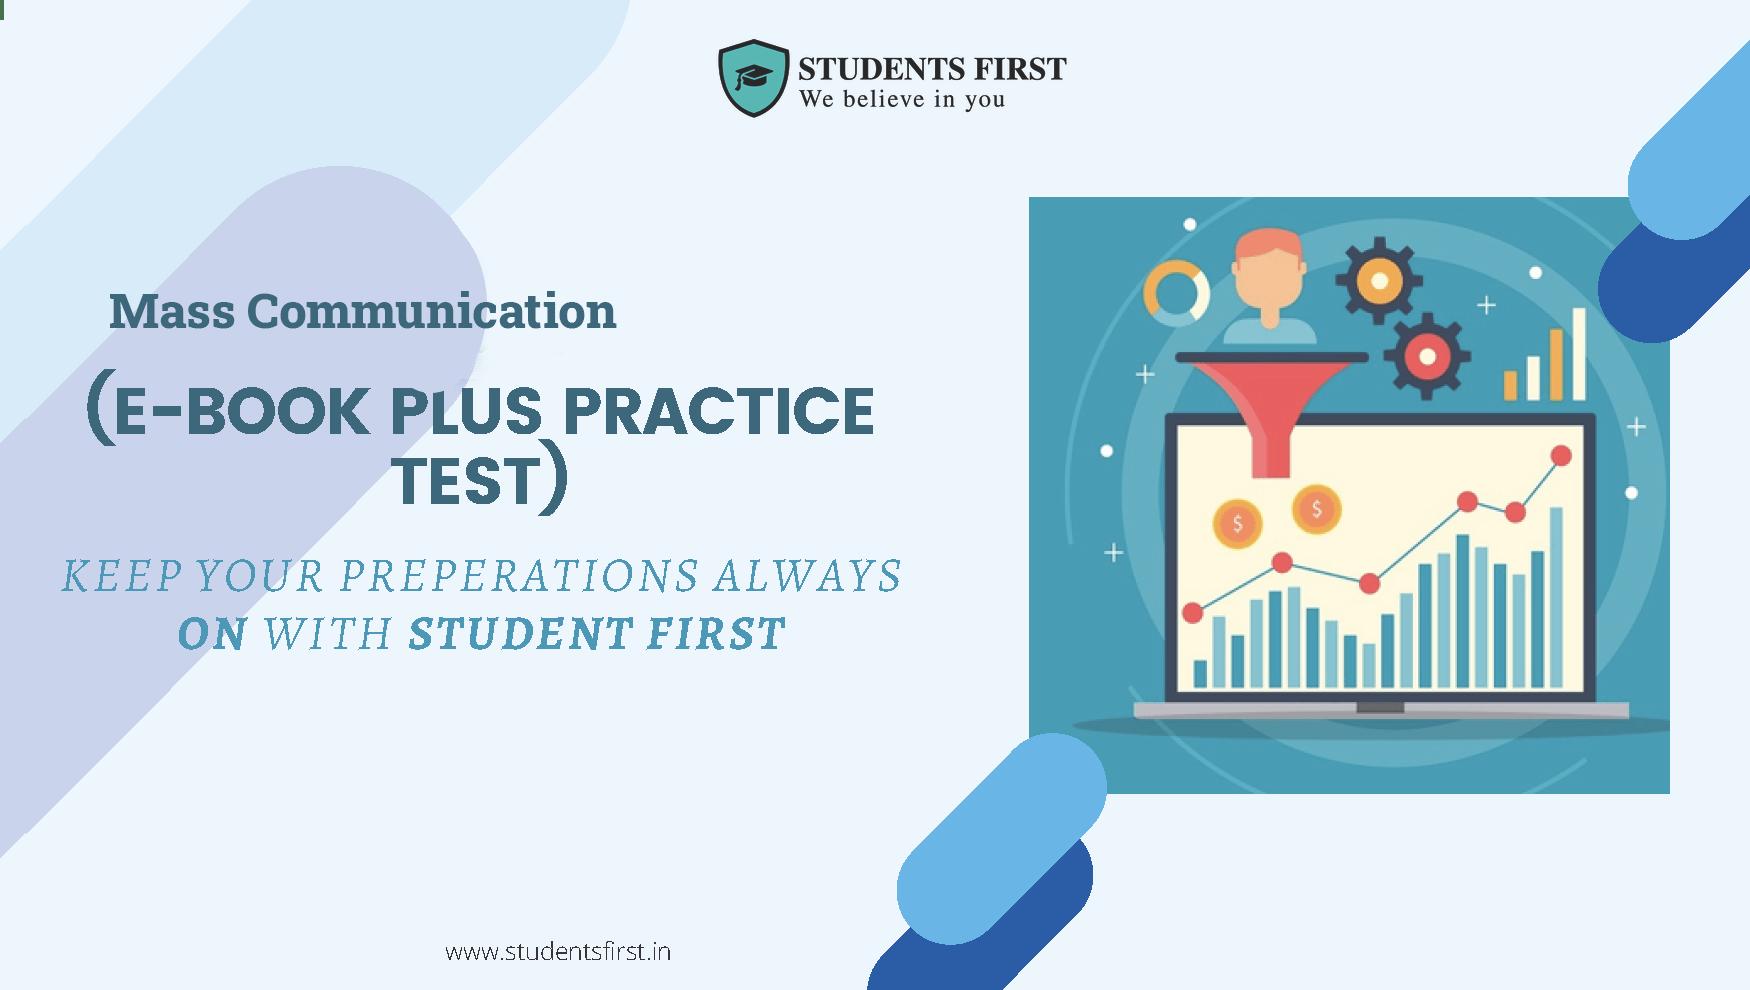 Mass-communication-E-BOOK-PLUS-PRACTICE-TEST